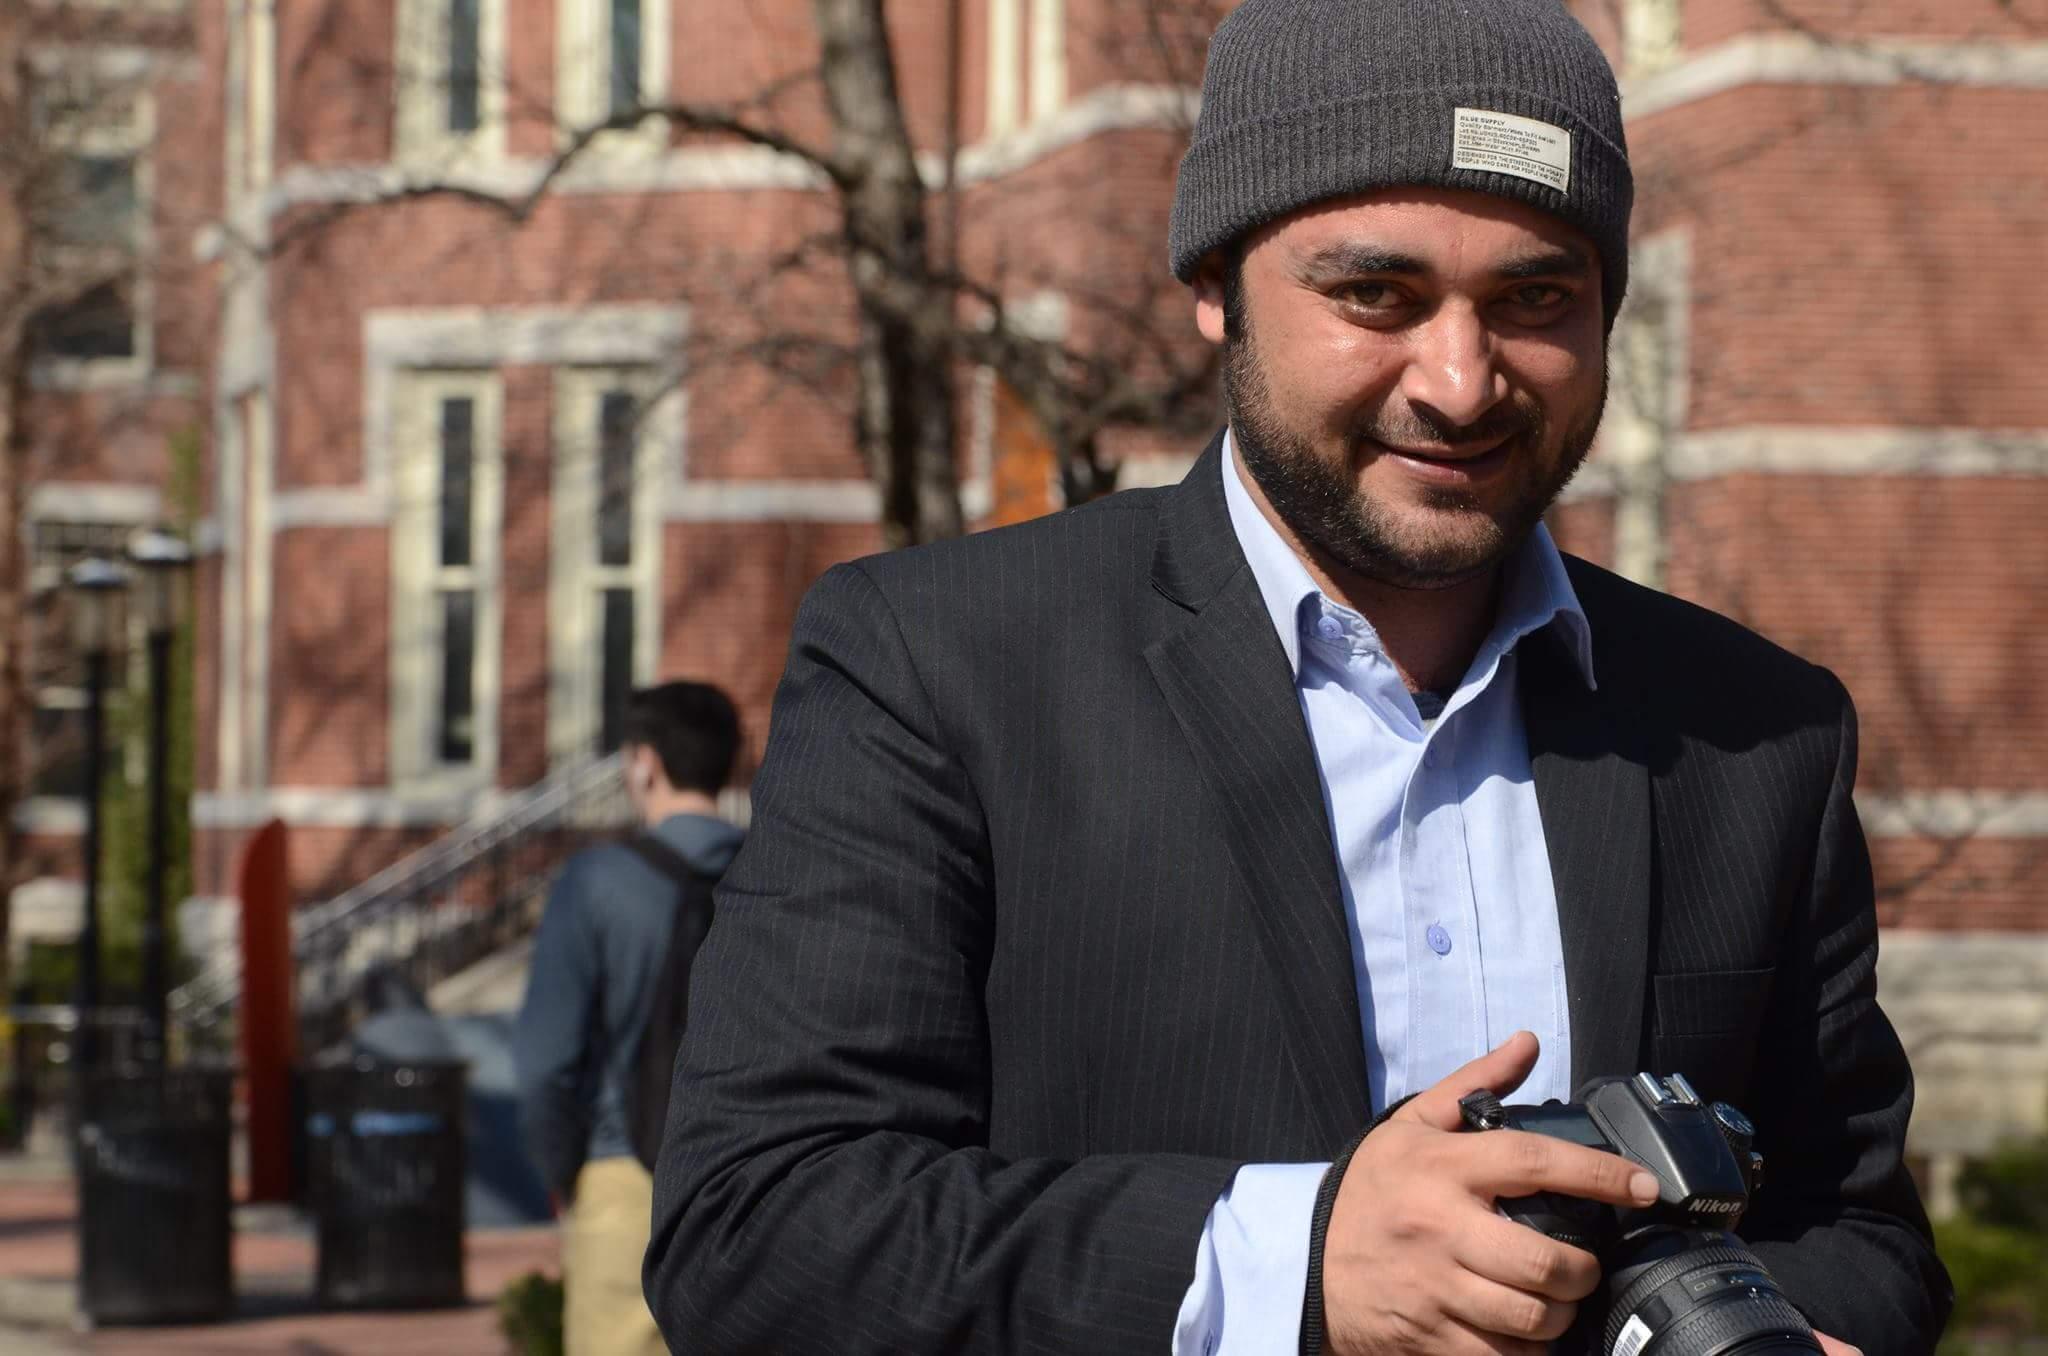 Crime reporter undaunted by dangers in northwest Pakistan